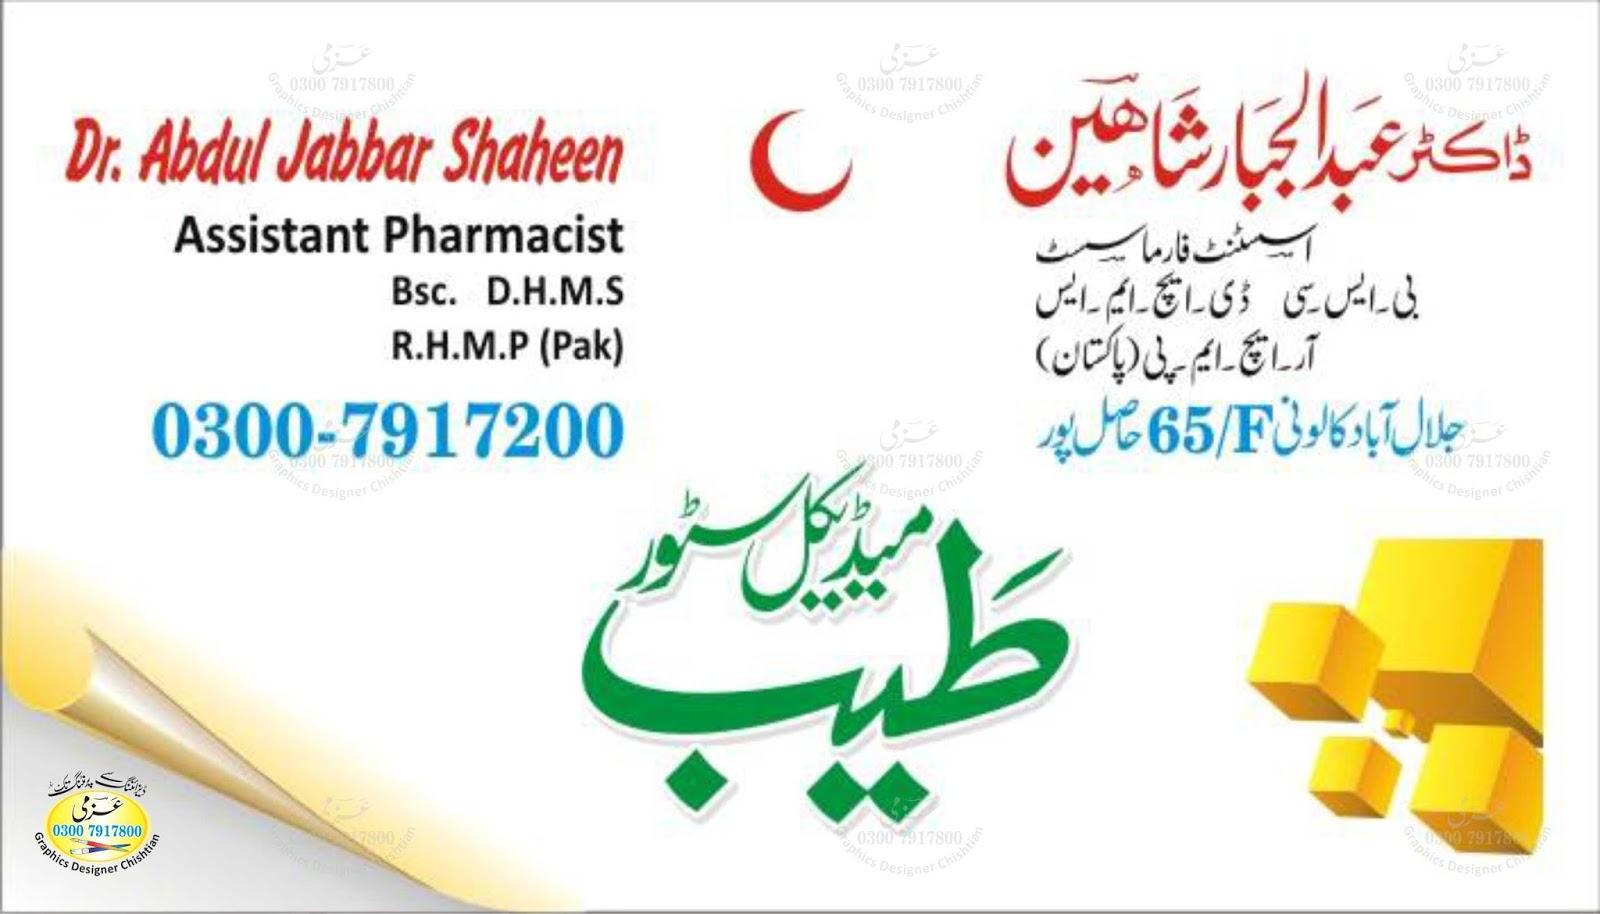 Dr. Abdul Jabbar Shaheen Hasilpur BUSINESS CARD BY AZMI - Azmi G